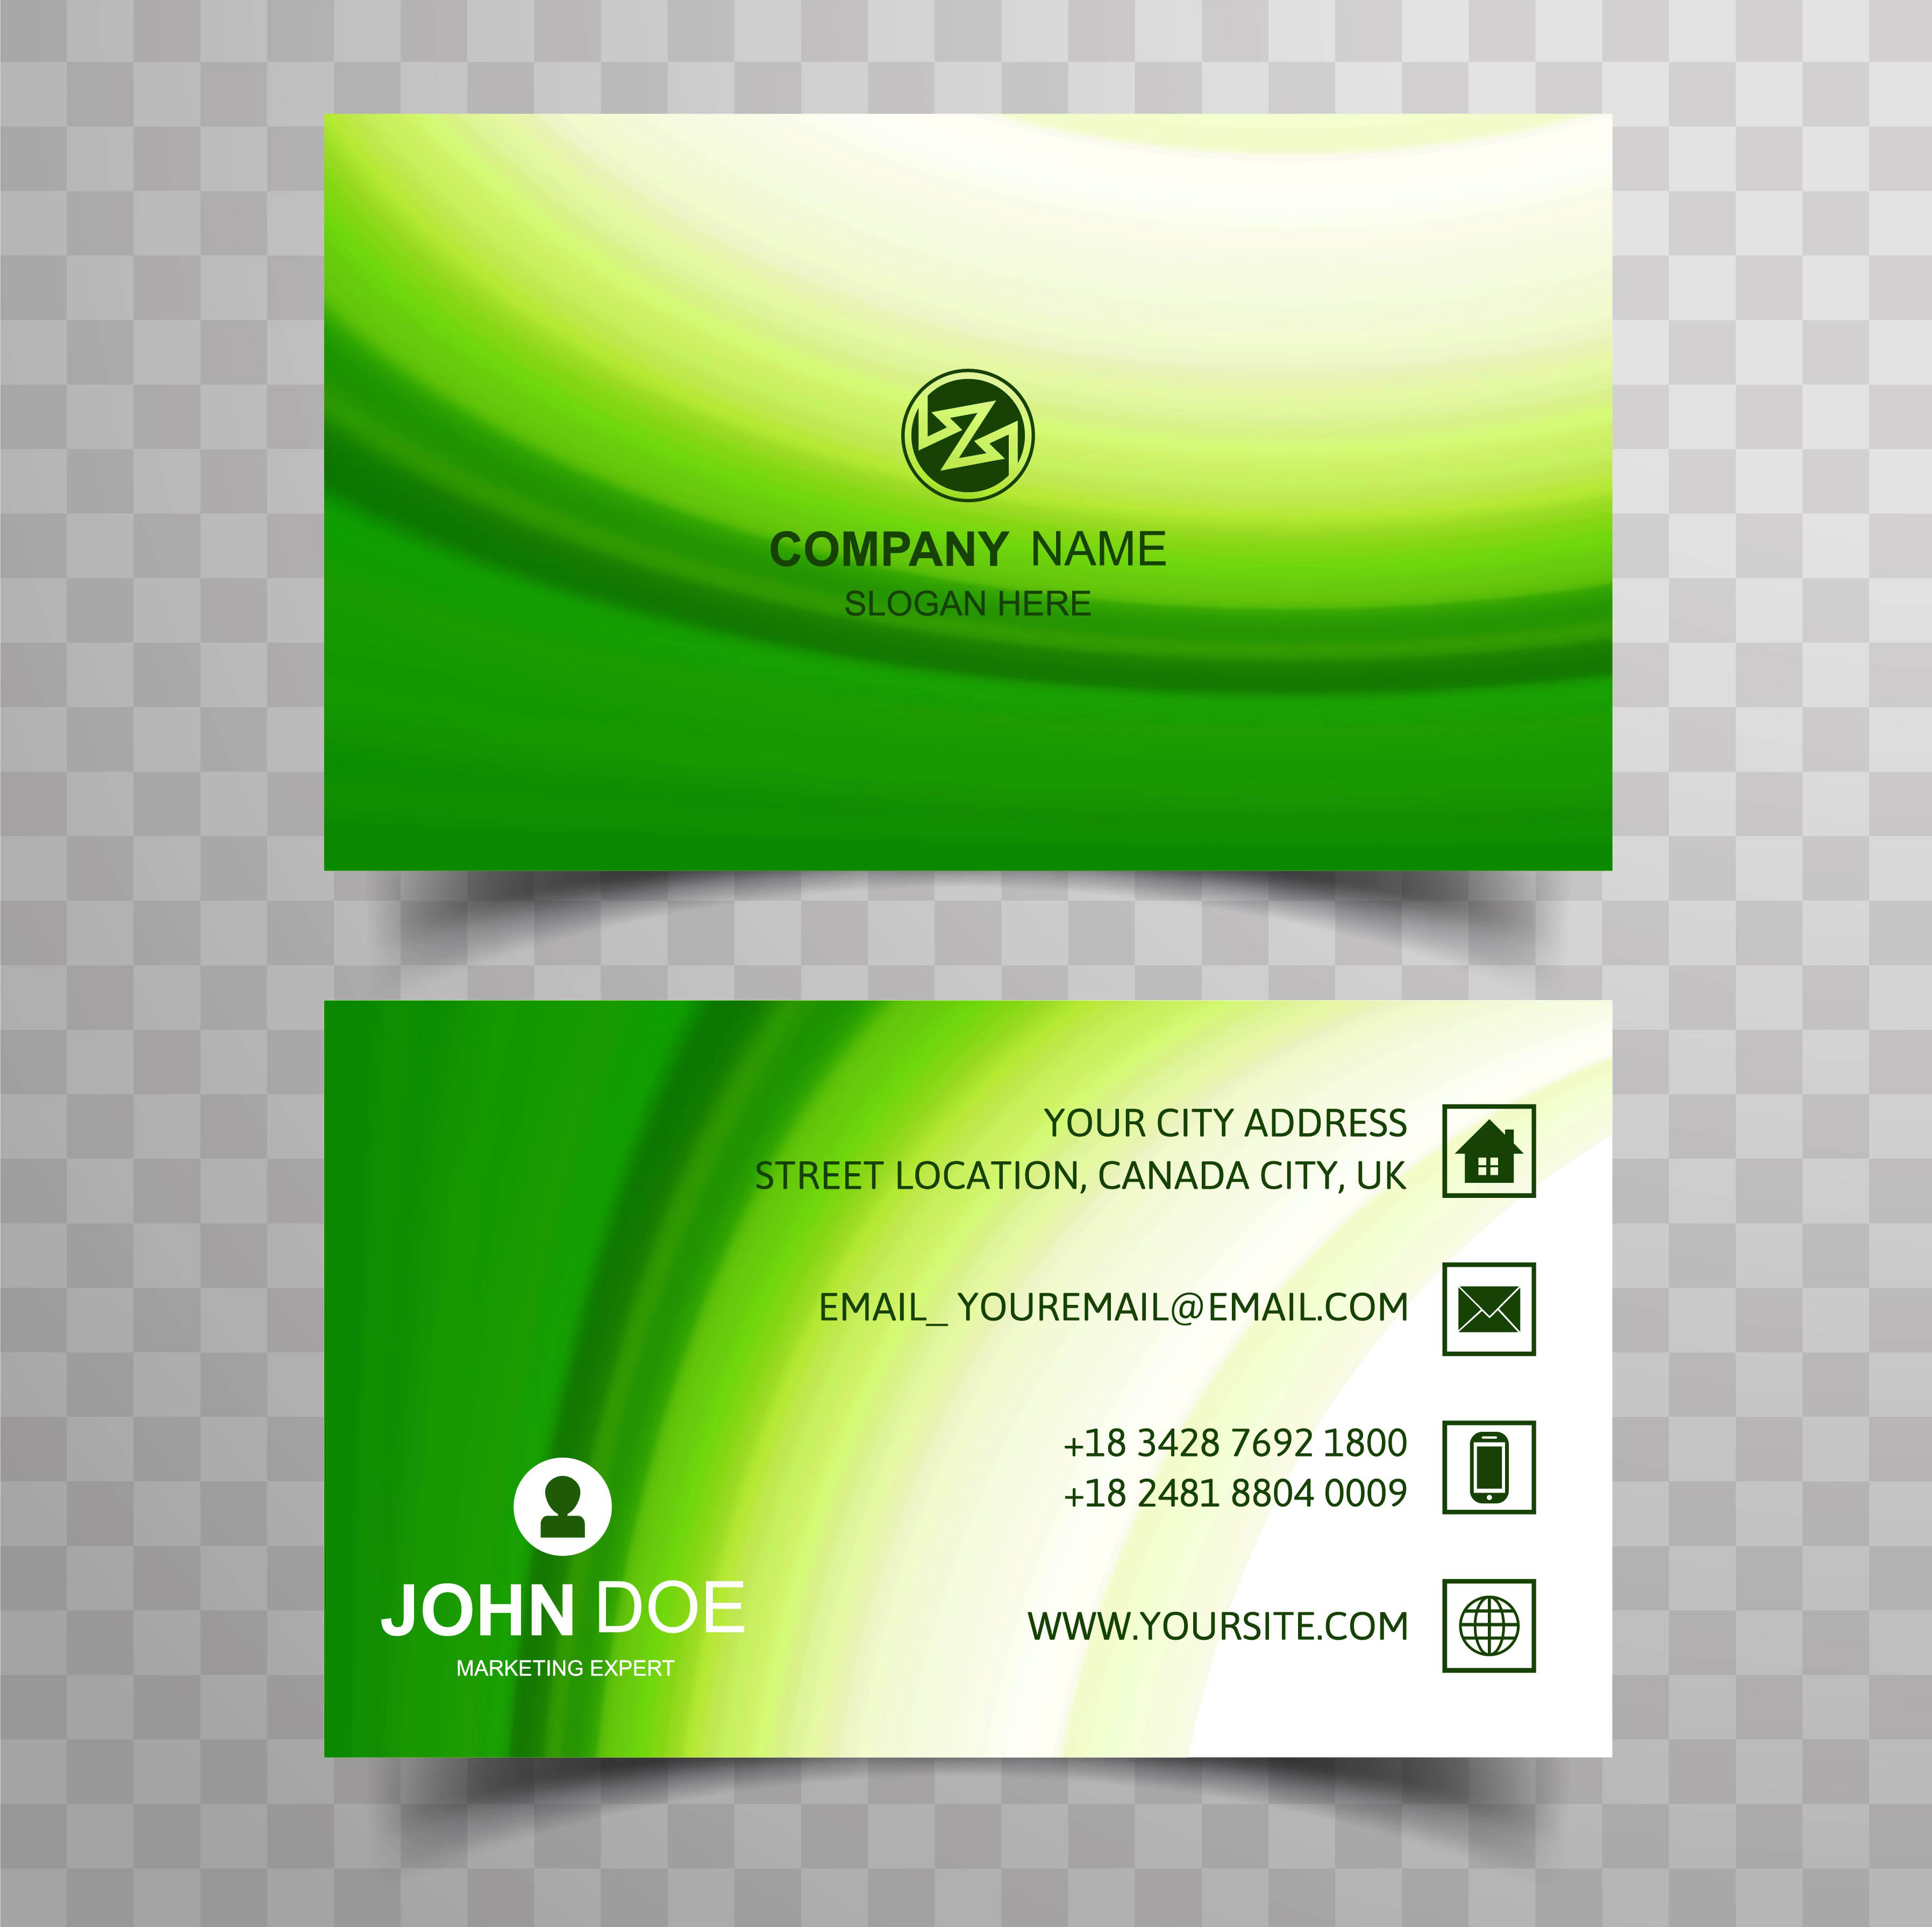 Modern business card background 245198 Vector Art at Vecteezy